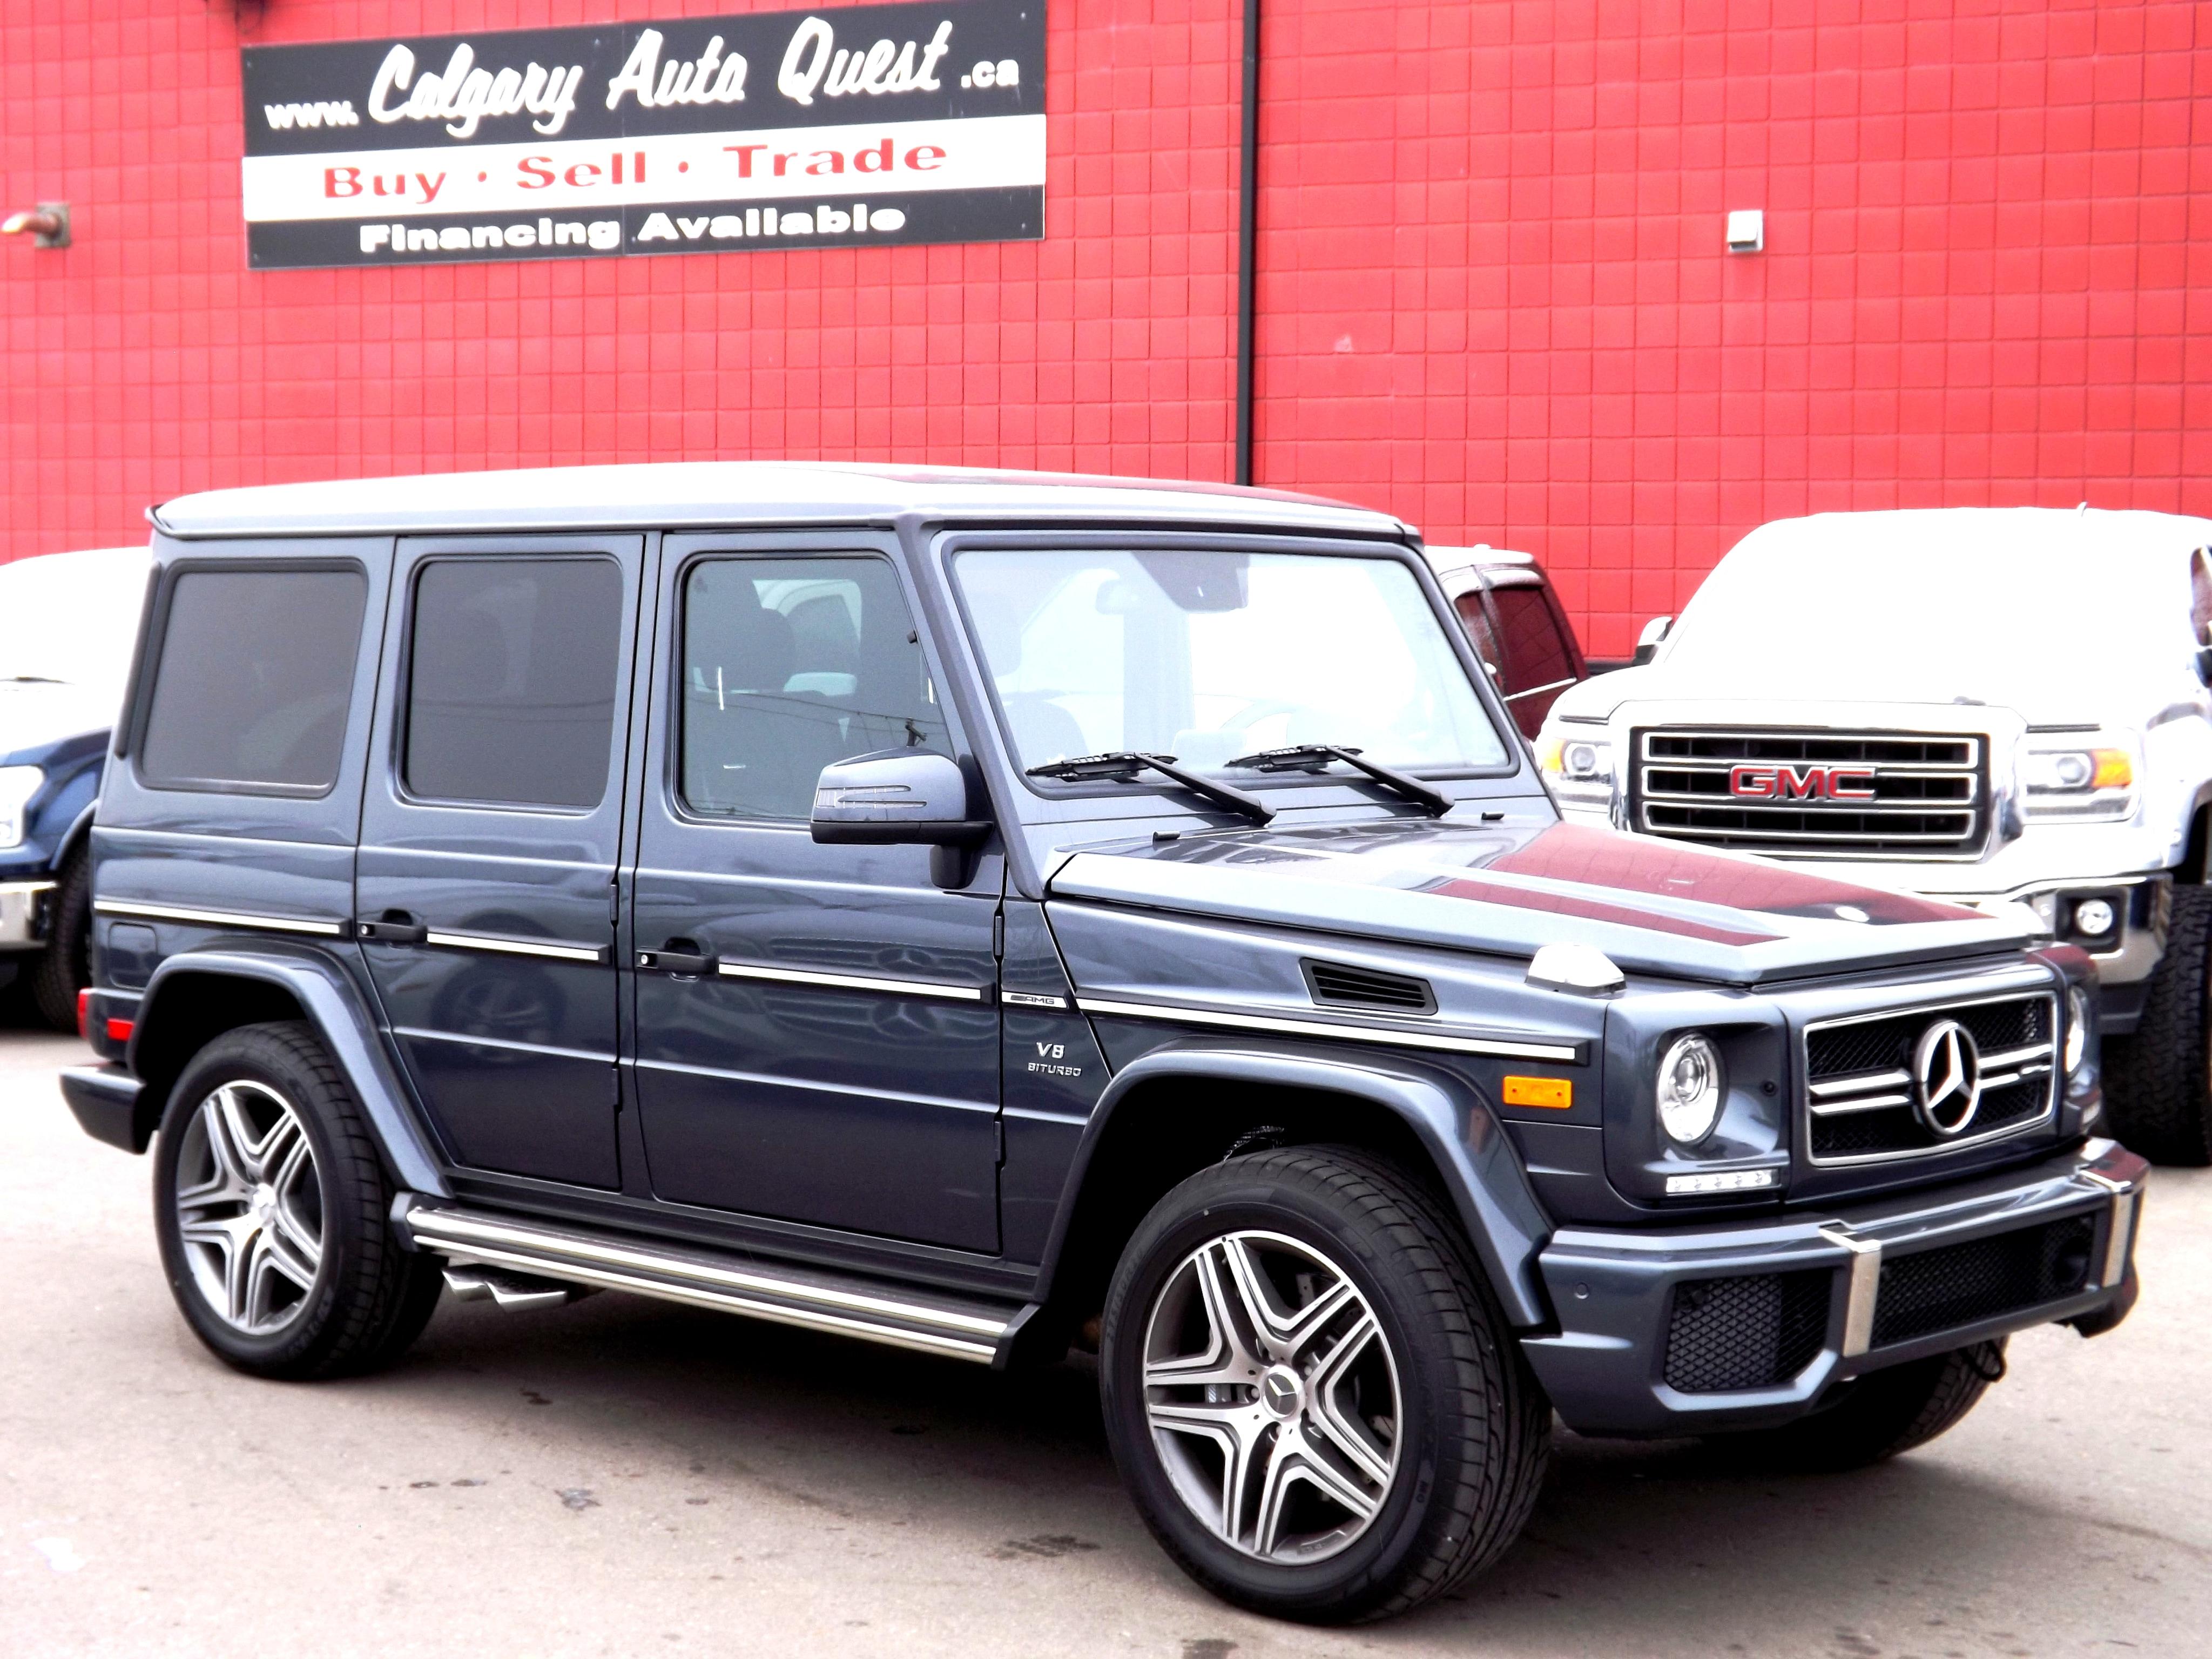 Calgary Auto Quest | Used Car Dealership In Calgary